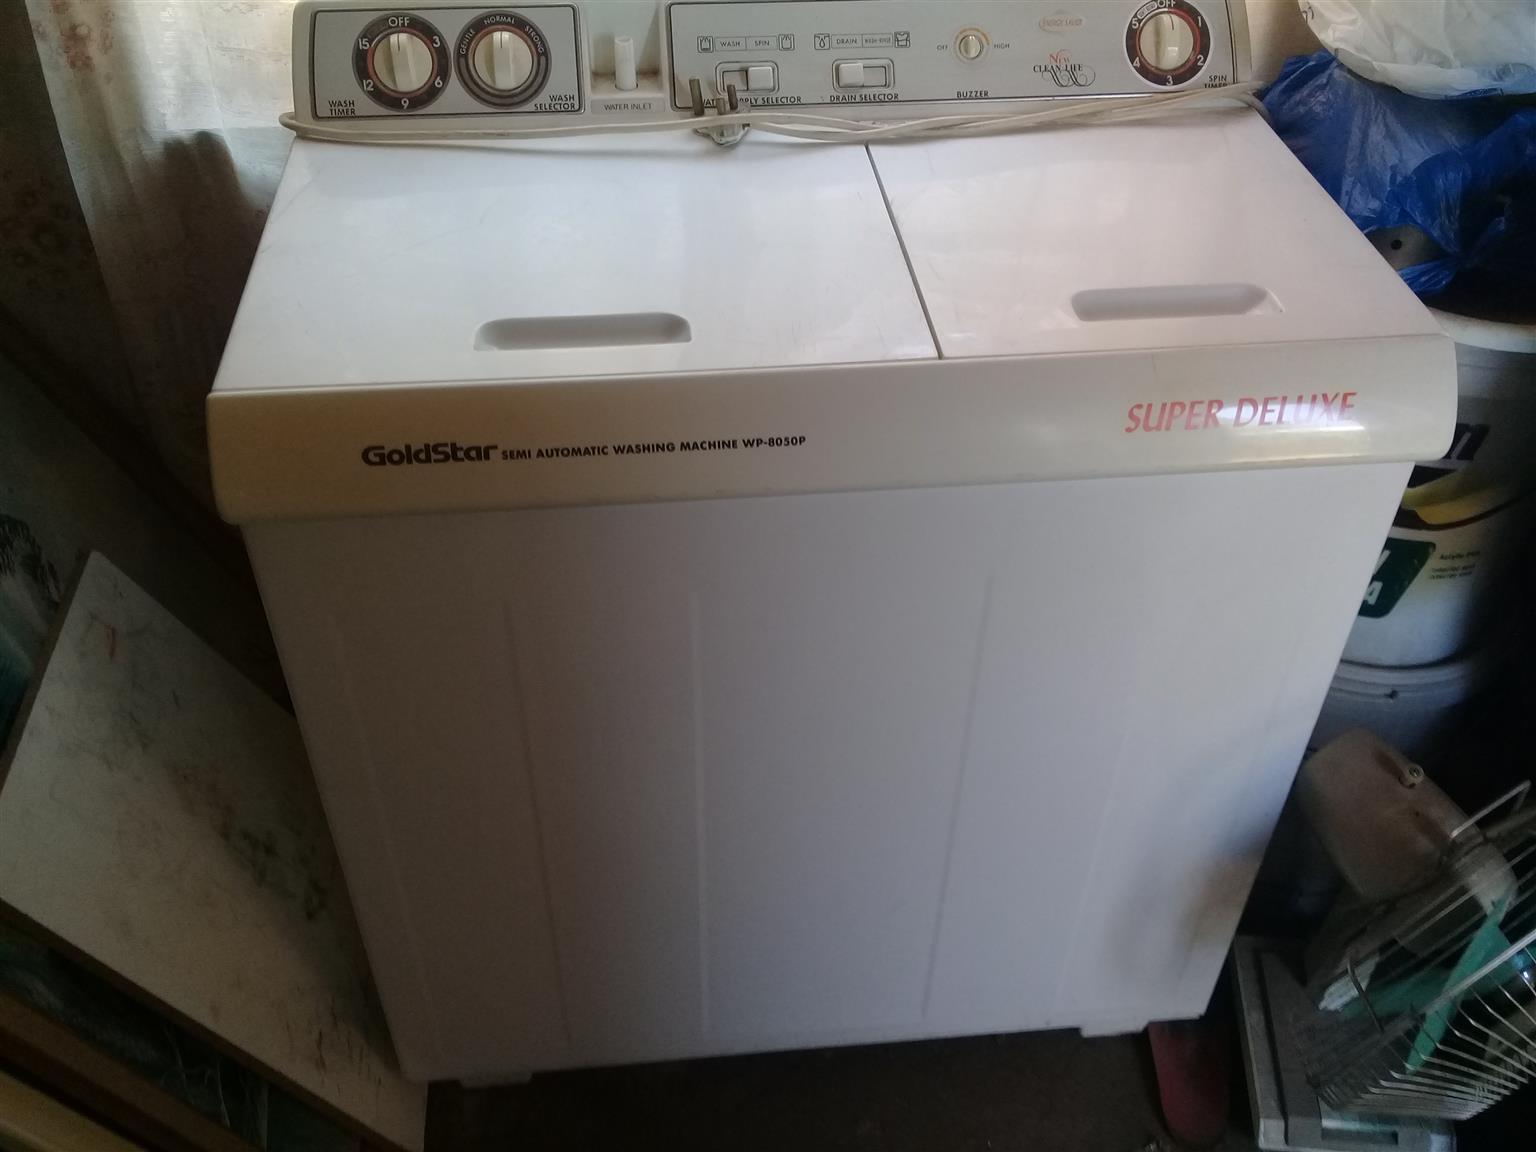 GOLDSTAR semi automatic washing machine